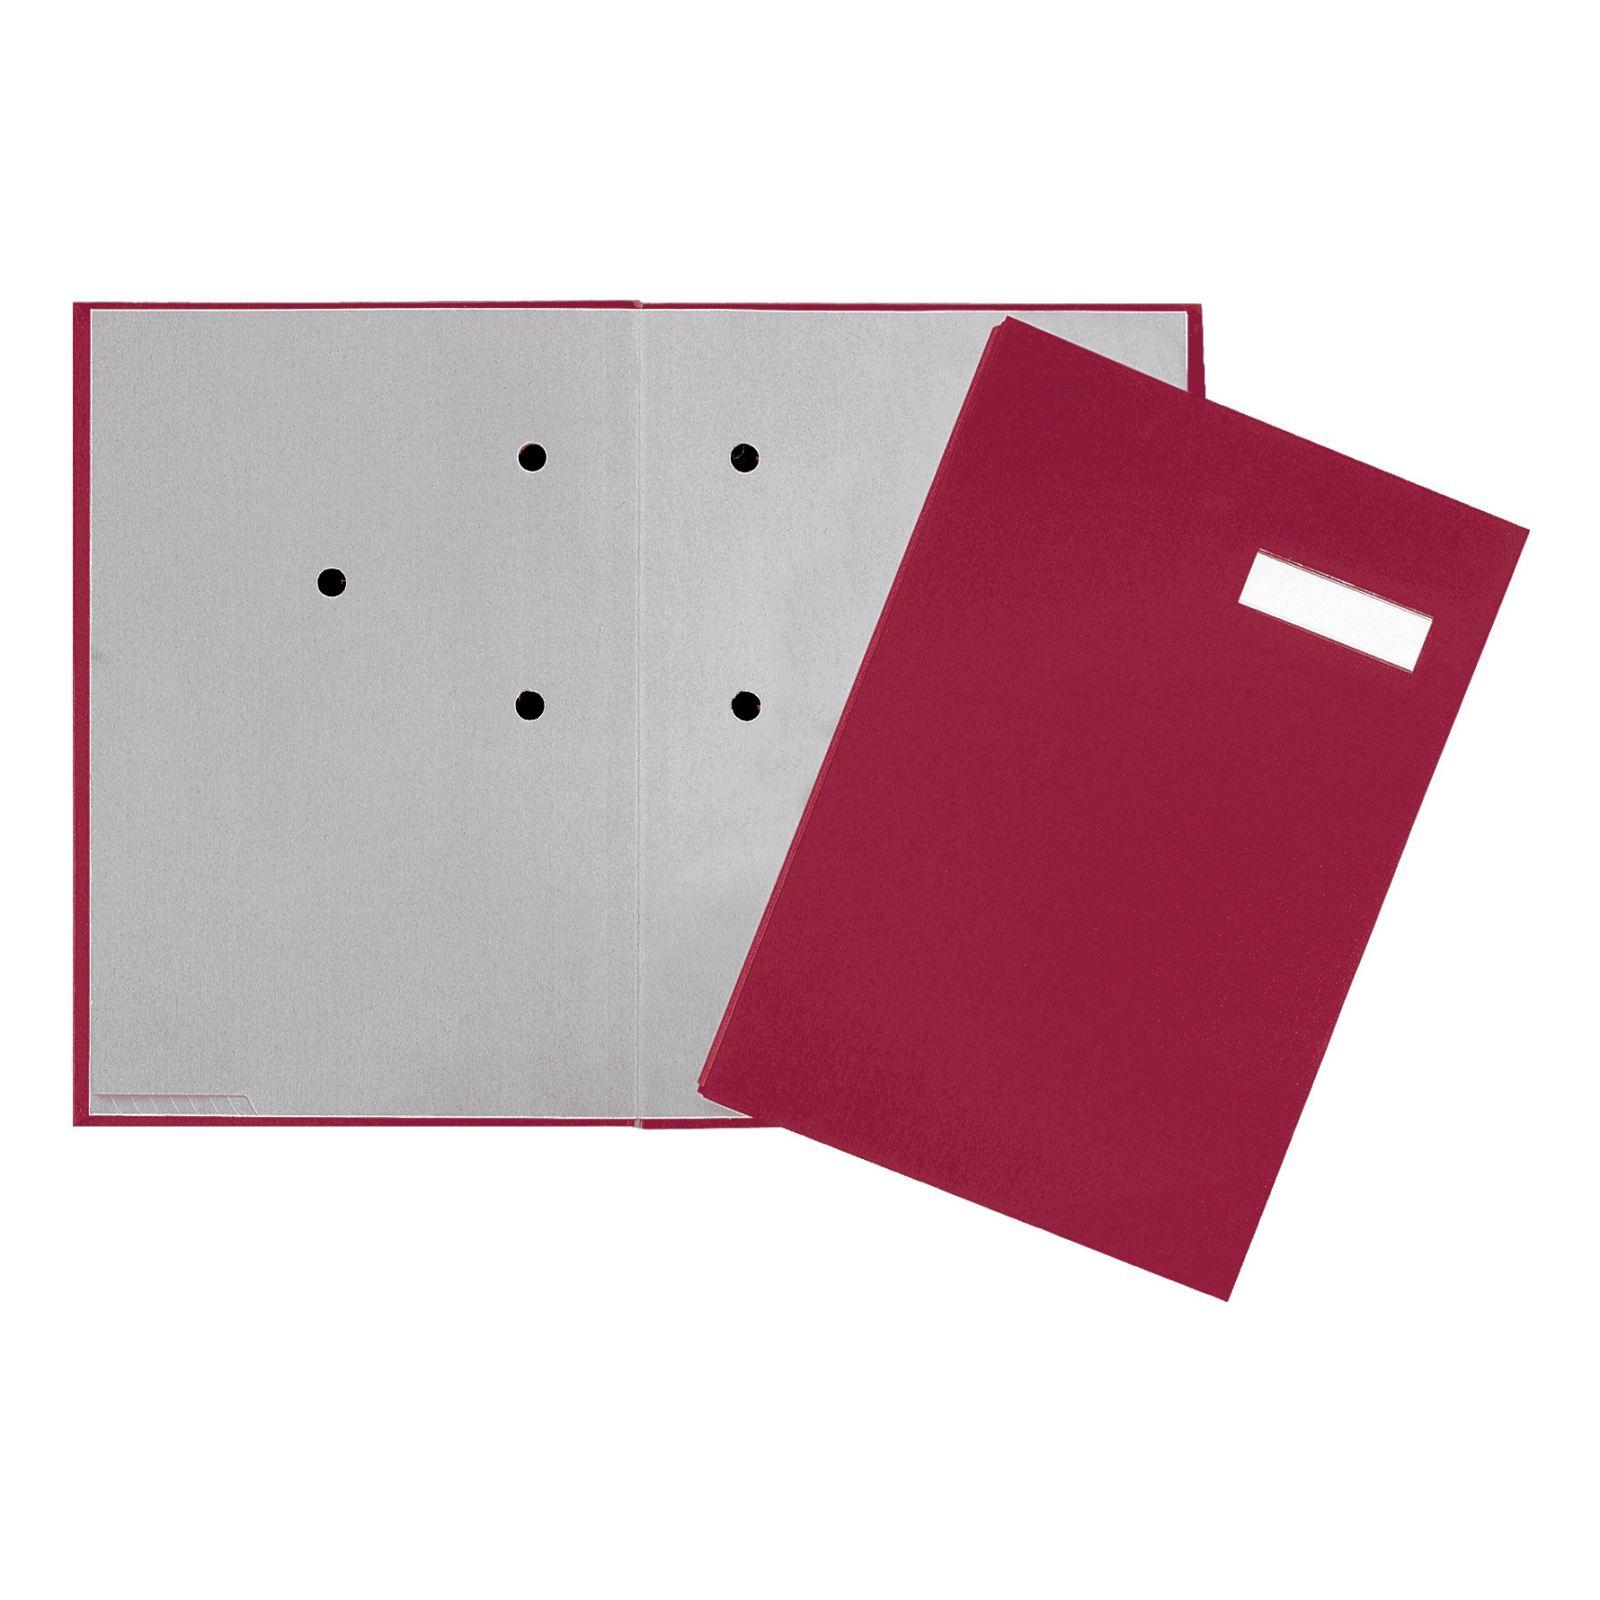 Pagna Unterschriftsmappe 20 Fächer - A4 - Karton - Rot - Weiß - Porträt - 240 mm - 25 mm